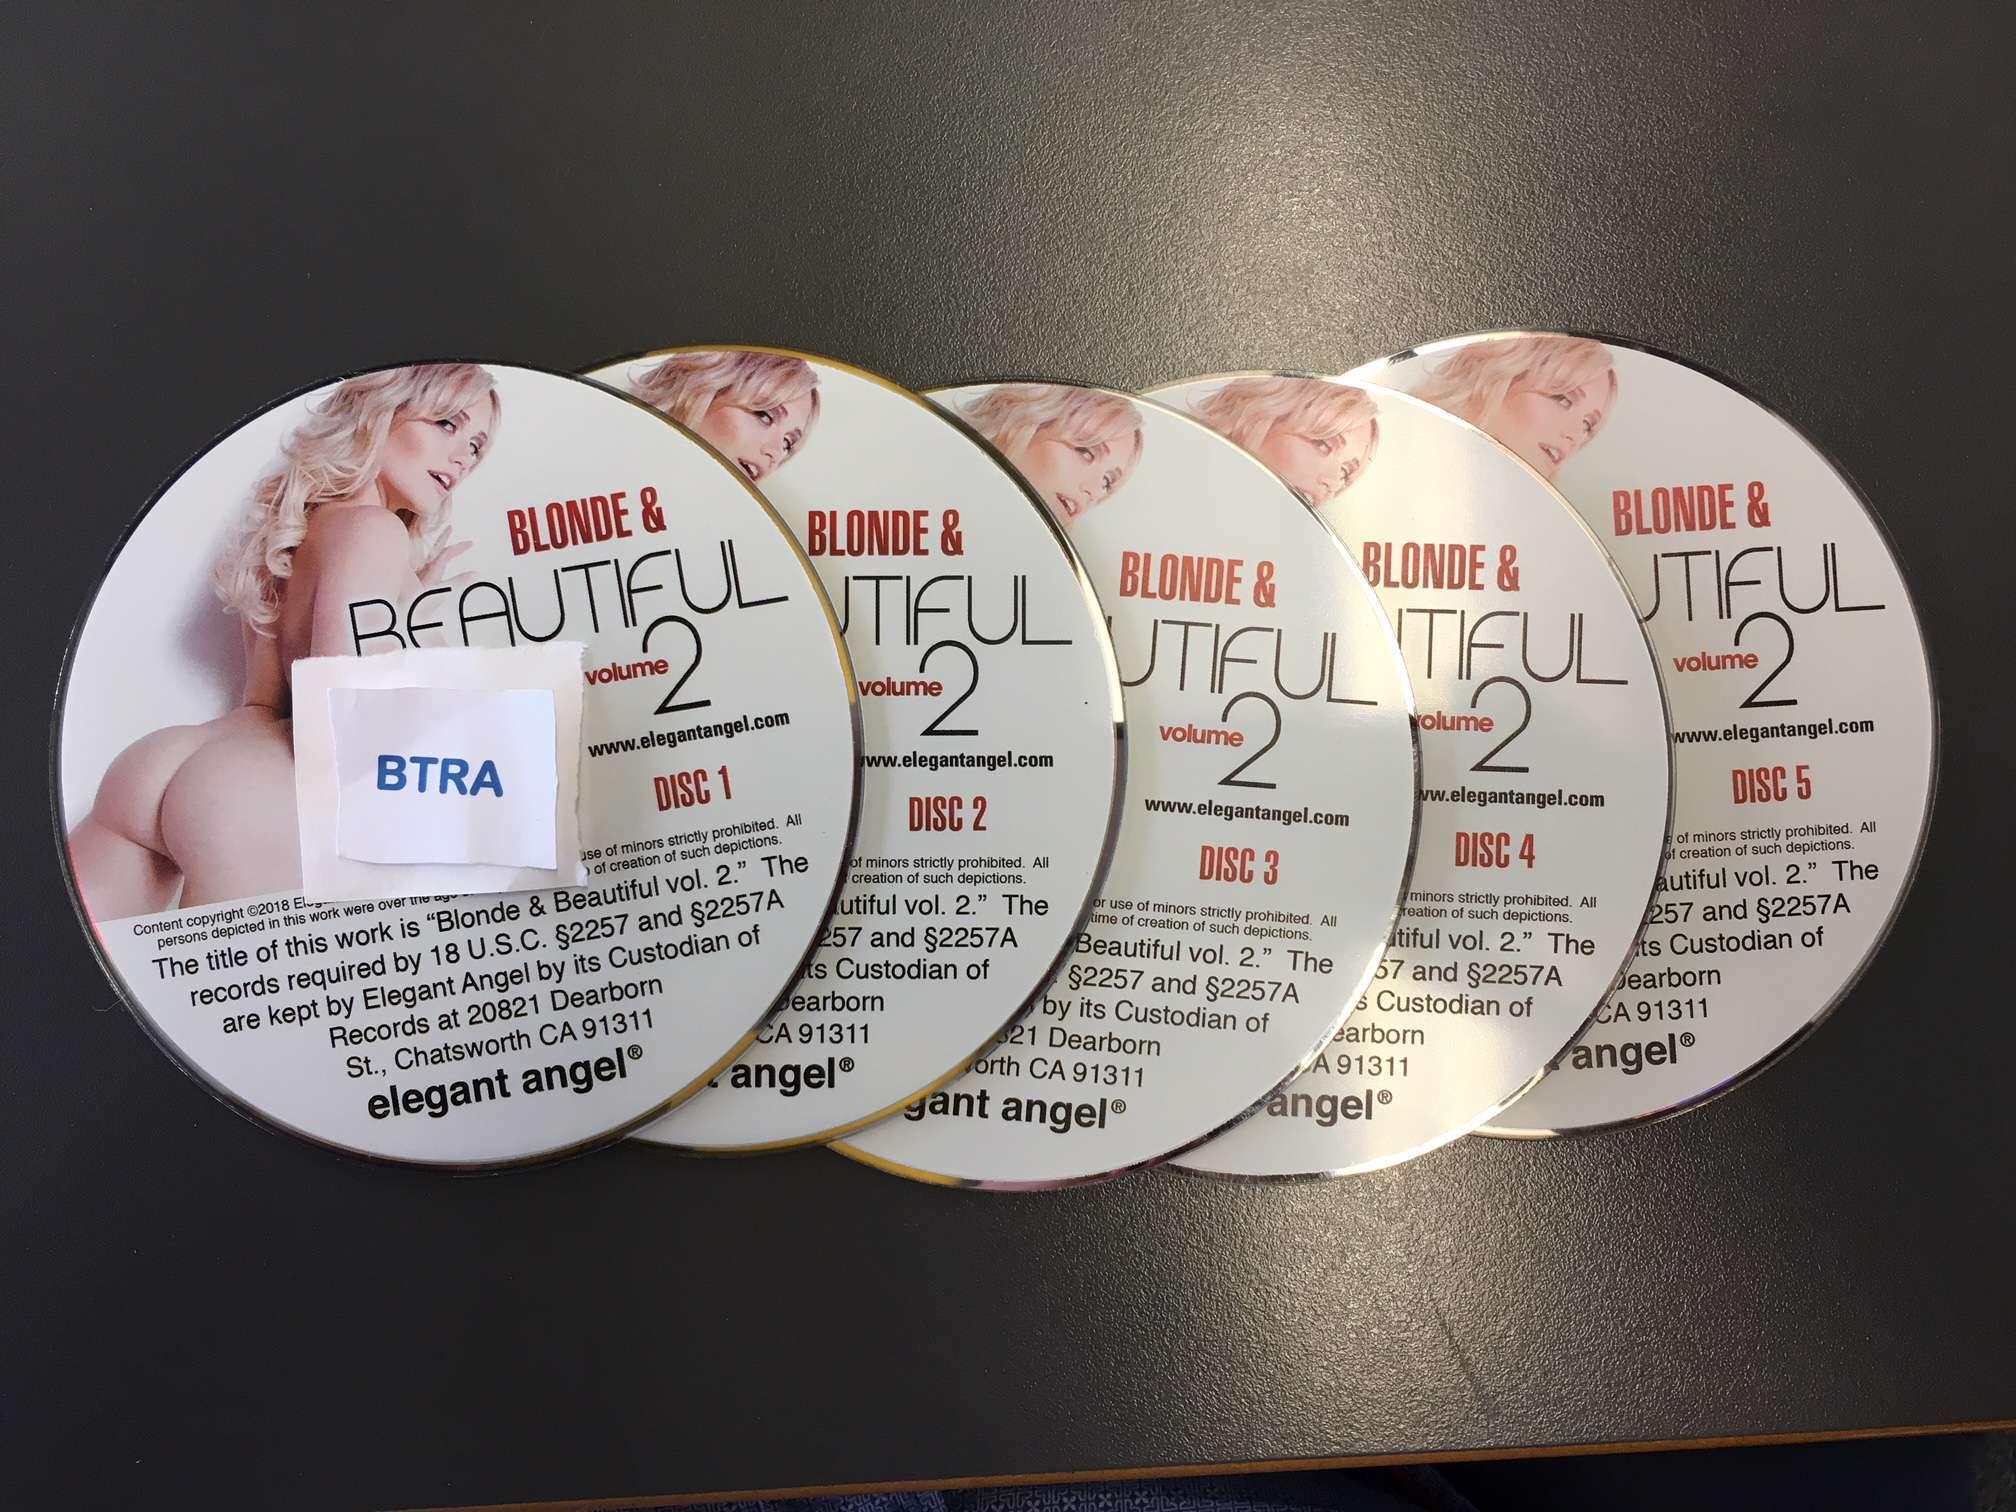 Blond And Beautiful 2 DiSC4 XXX DVDRip x264-BTRA